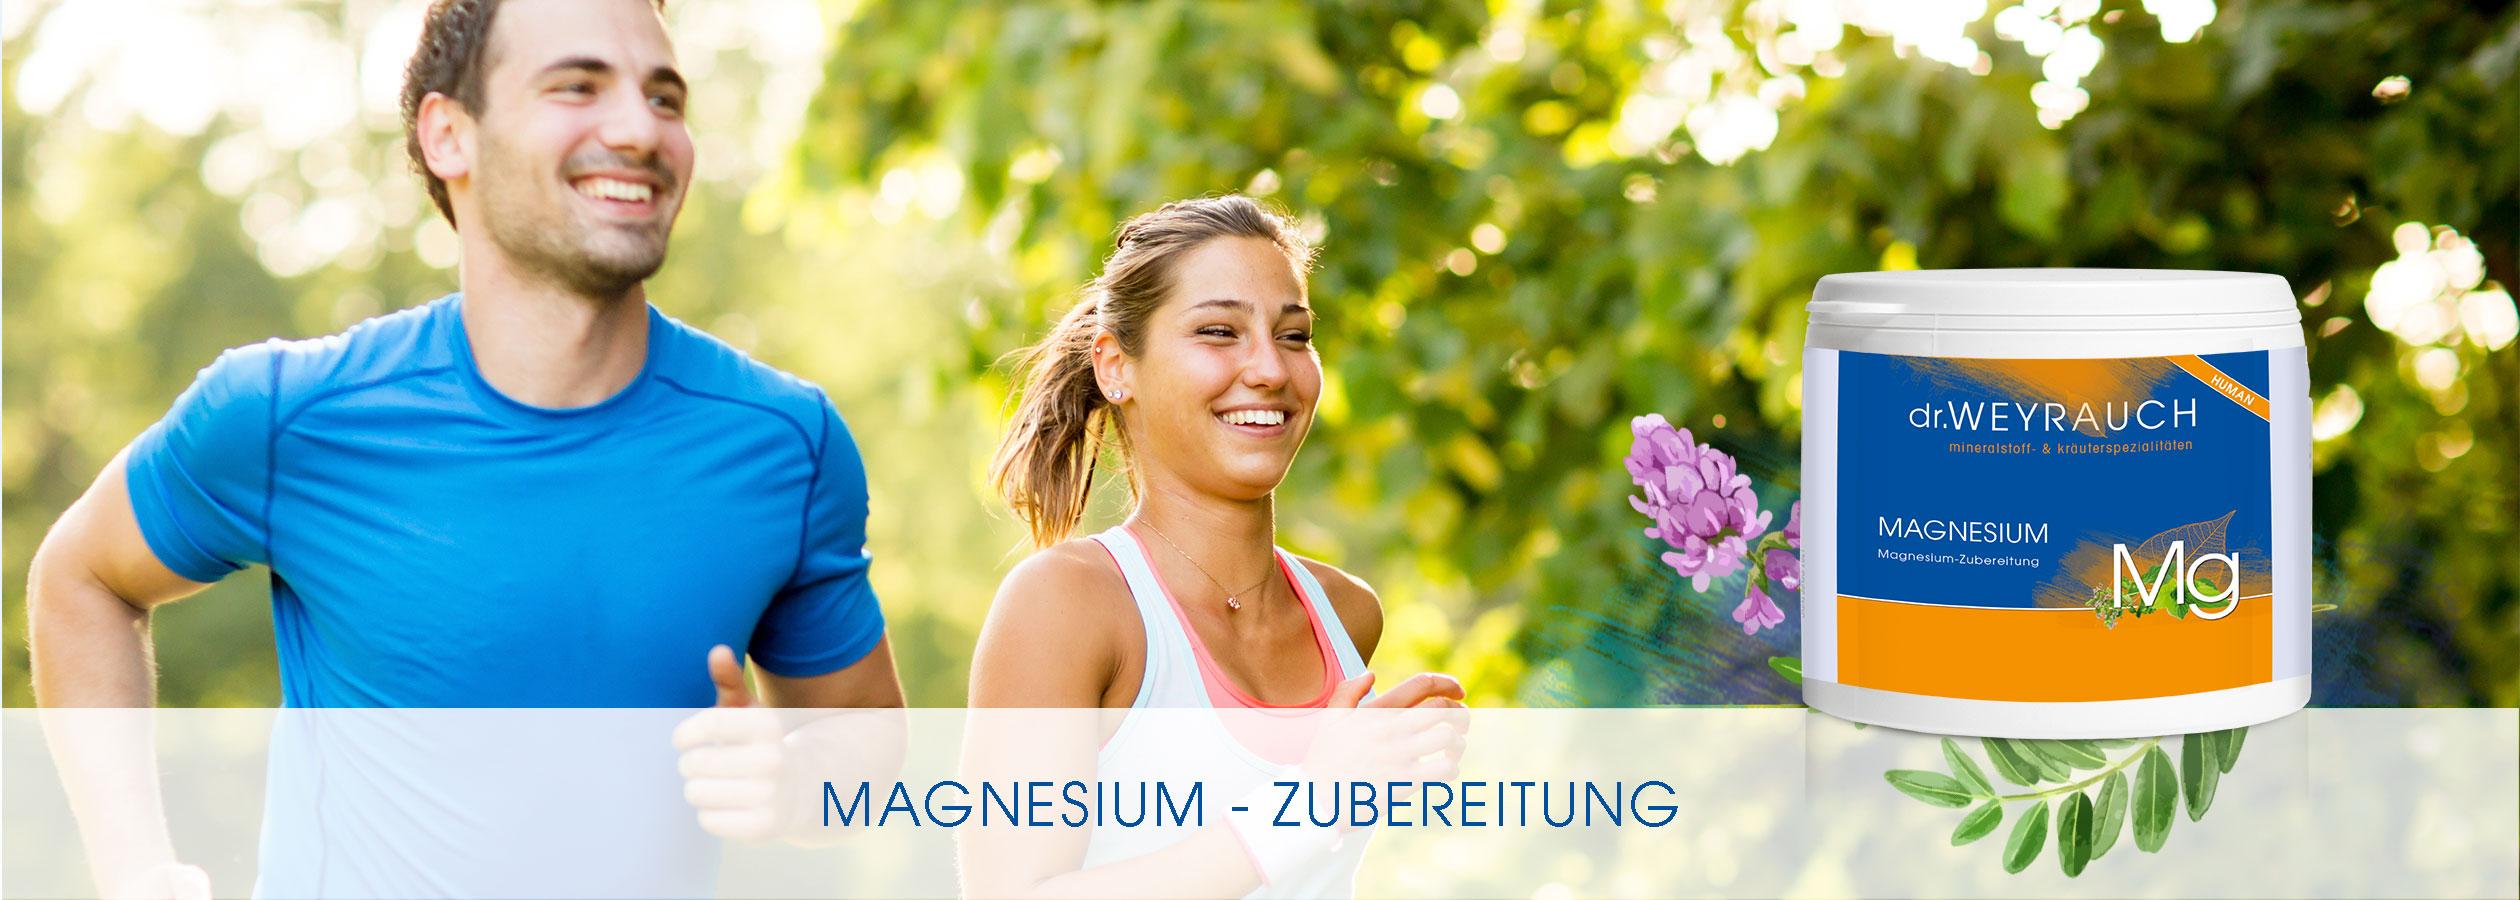 HEADER-2021-Magnesium-Human